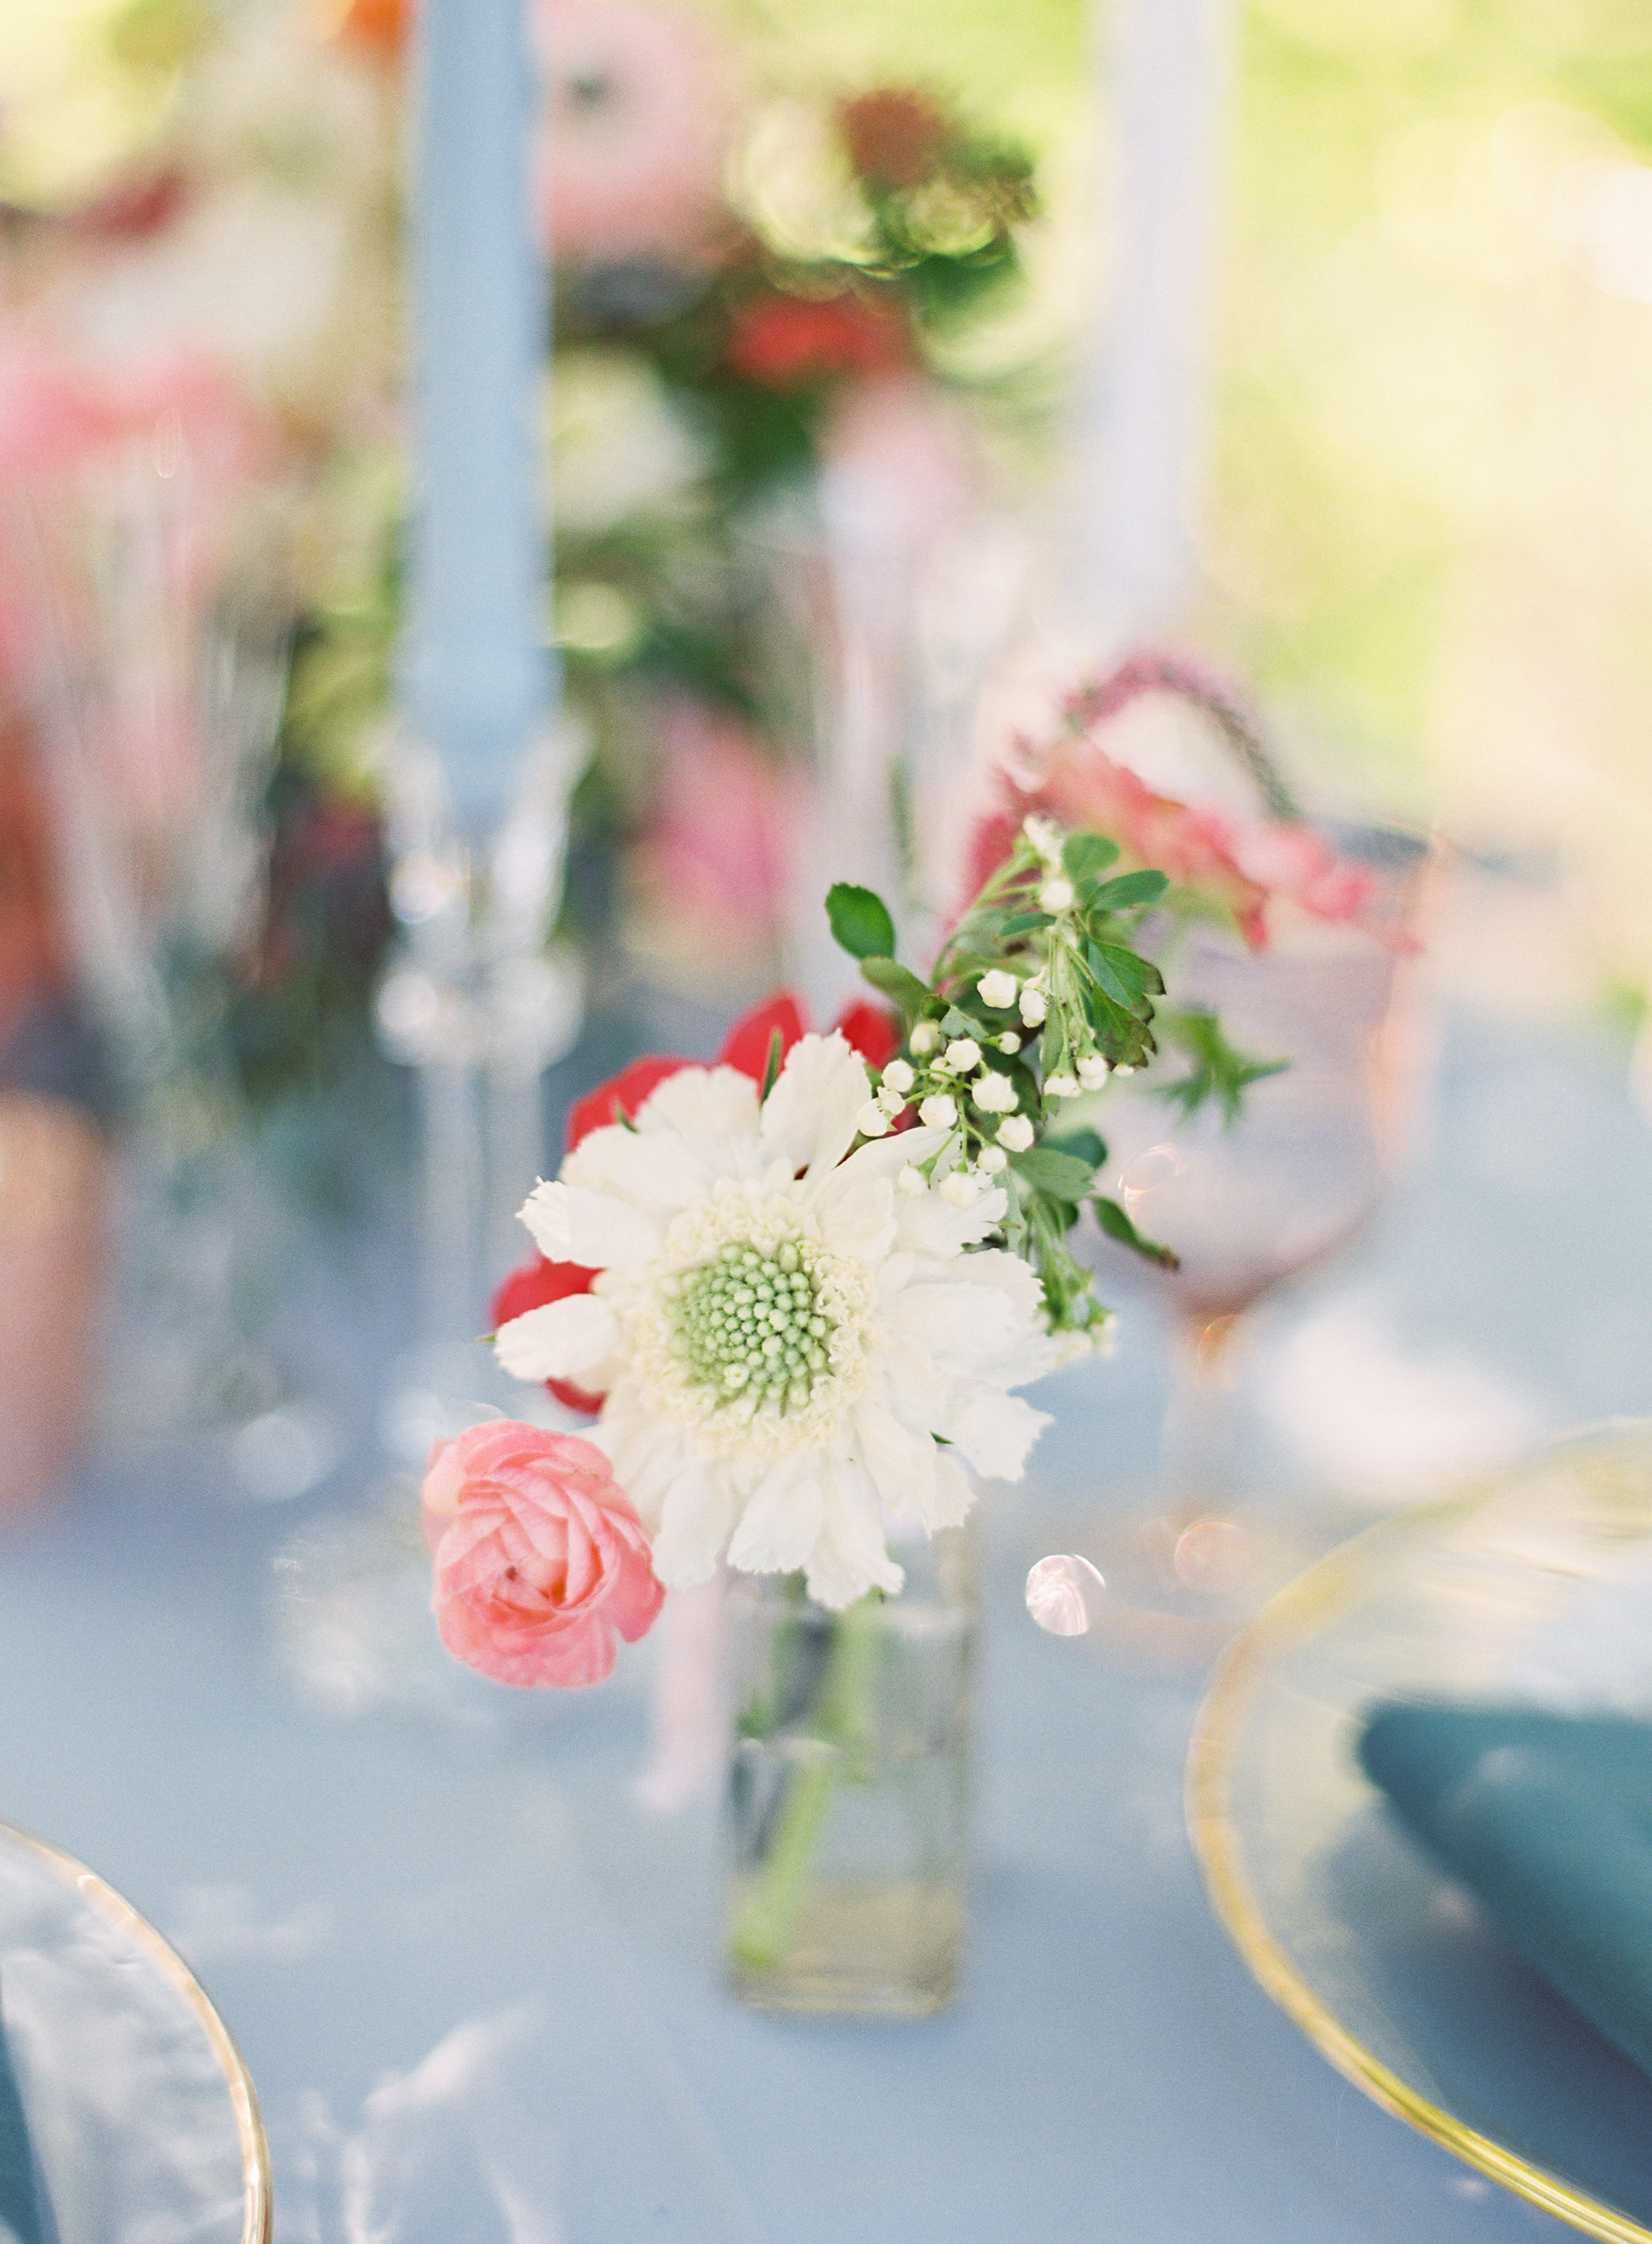 NathalieCheng_Monet_Styled_Table_025.jpg